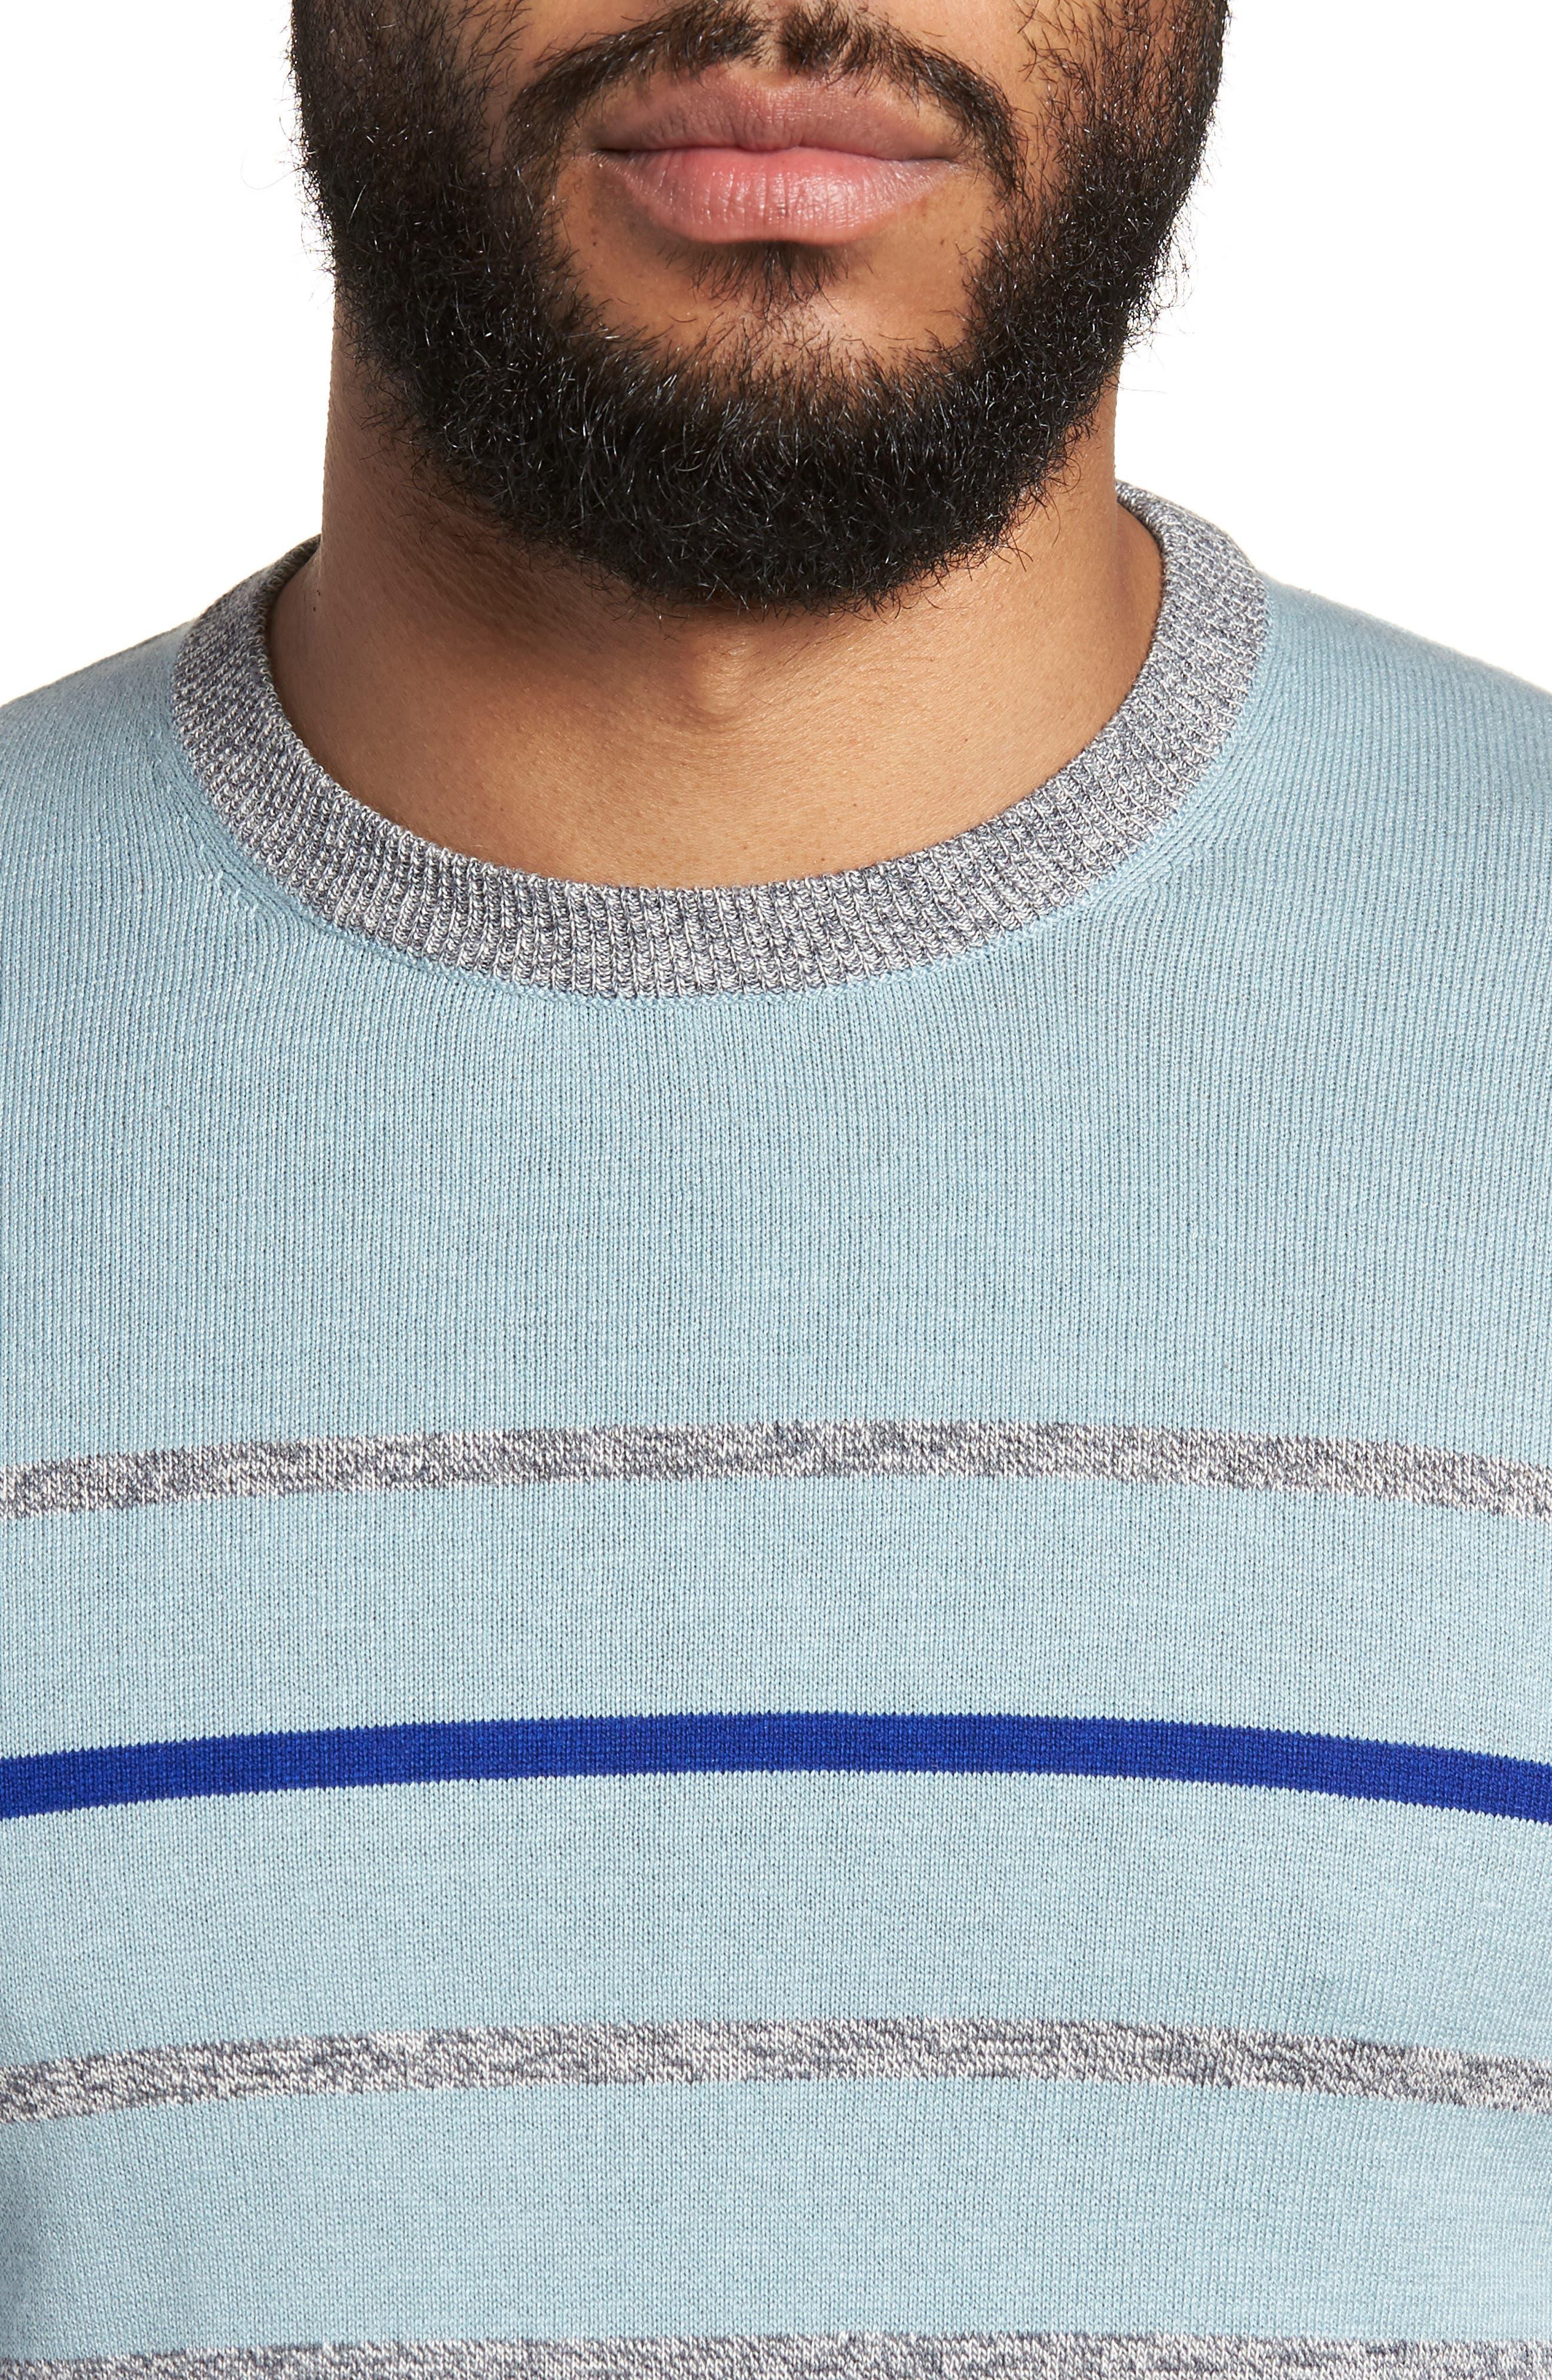 Britnay Trim Fit Stripe Crewneck Sweater,                             Alternate thumbnail 4, color,                             400